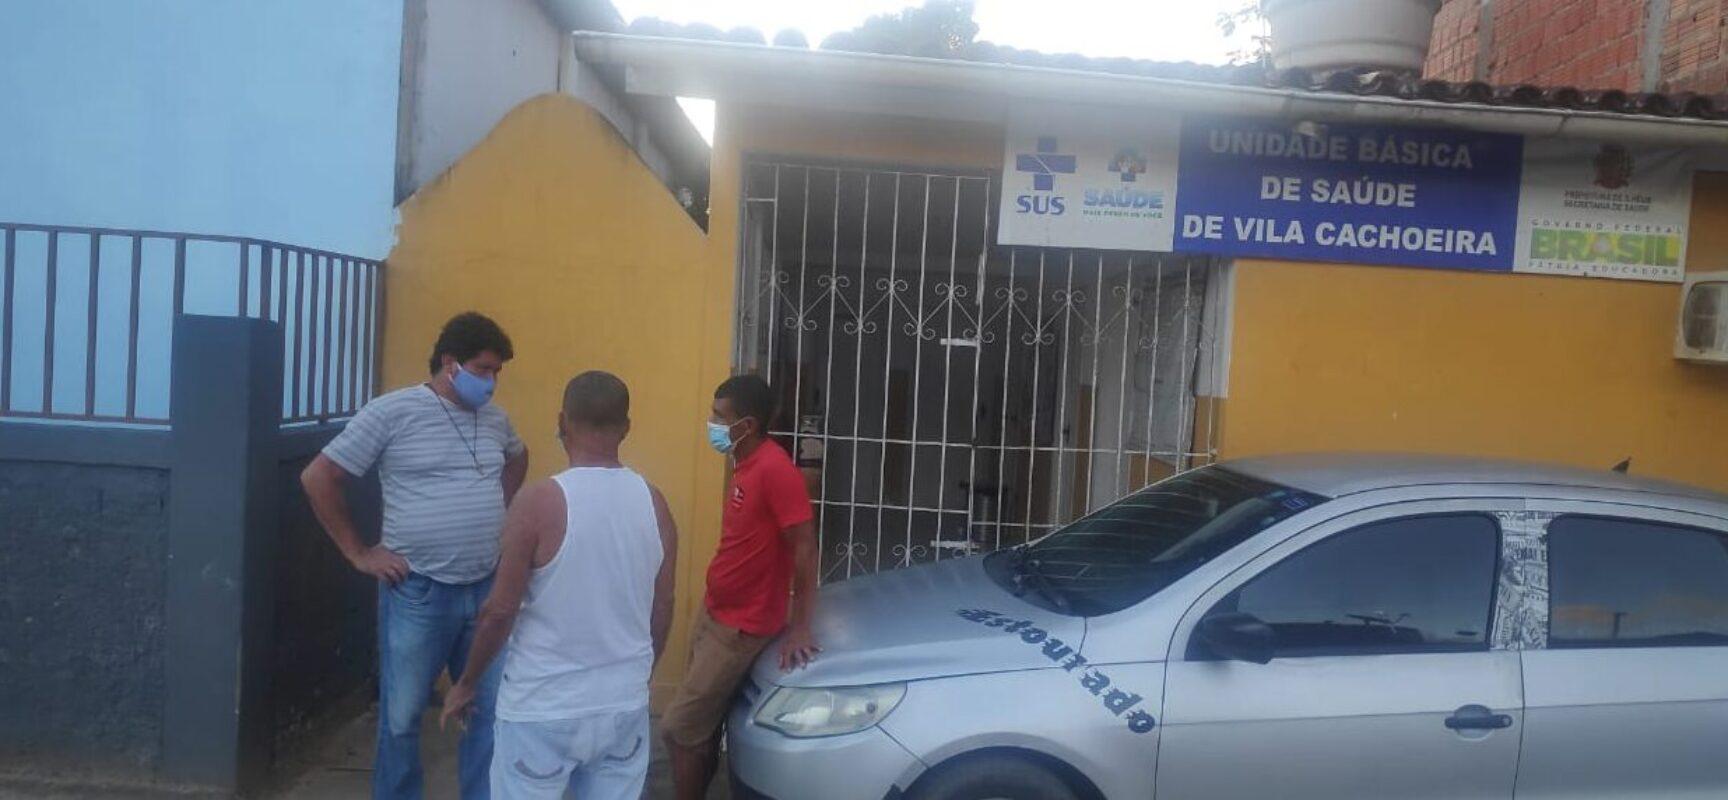 Vereador Edvaldo Gomes solicita serviços no Posto de Saúde de Vila Cachoeira